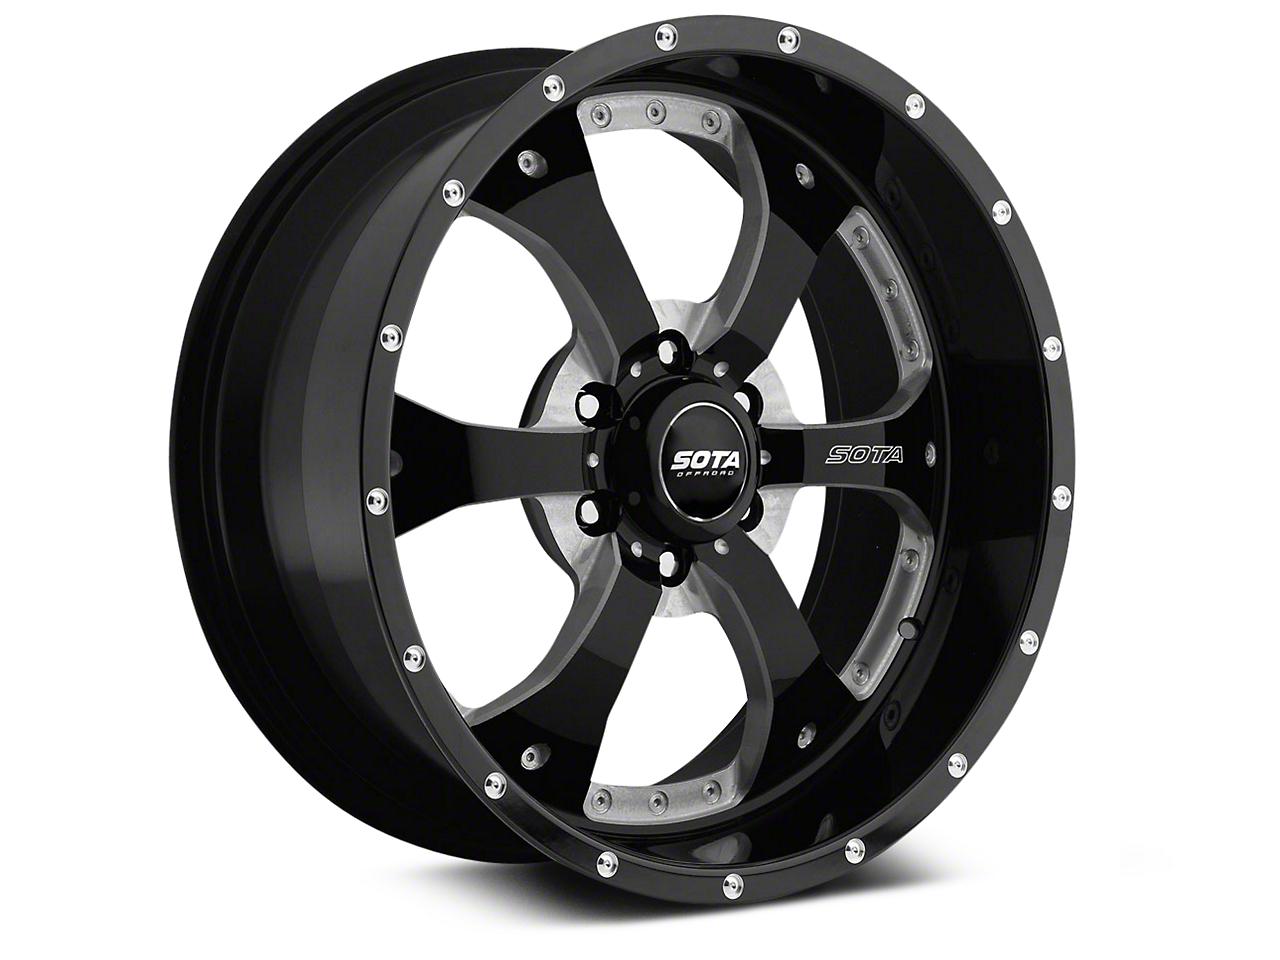 SOTA Off Road NOVAKANE Death Metal 6-Lug Wheel - 20x10 (07-18 Sierra 1500)